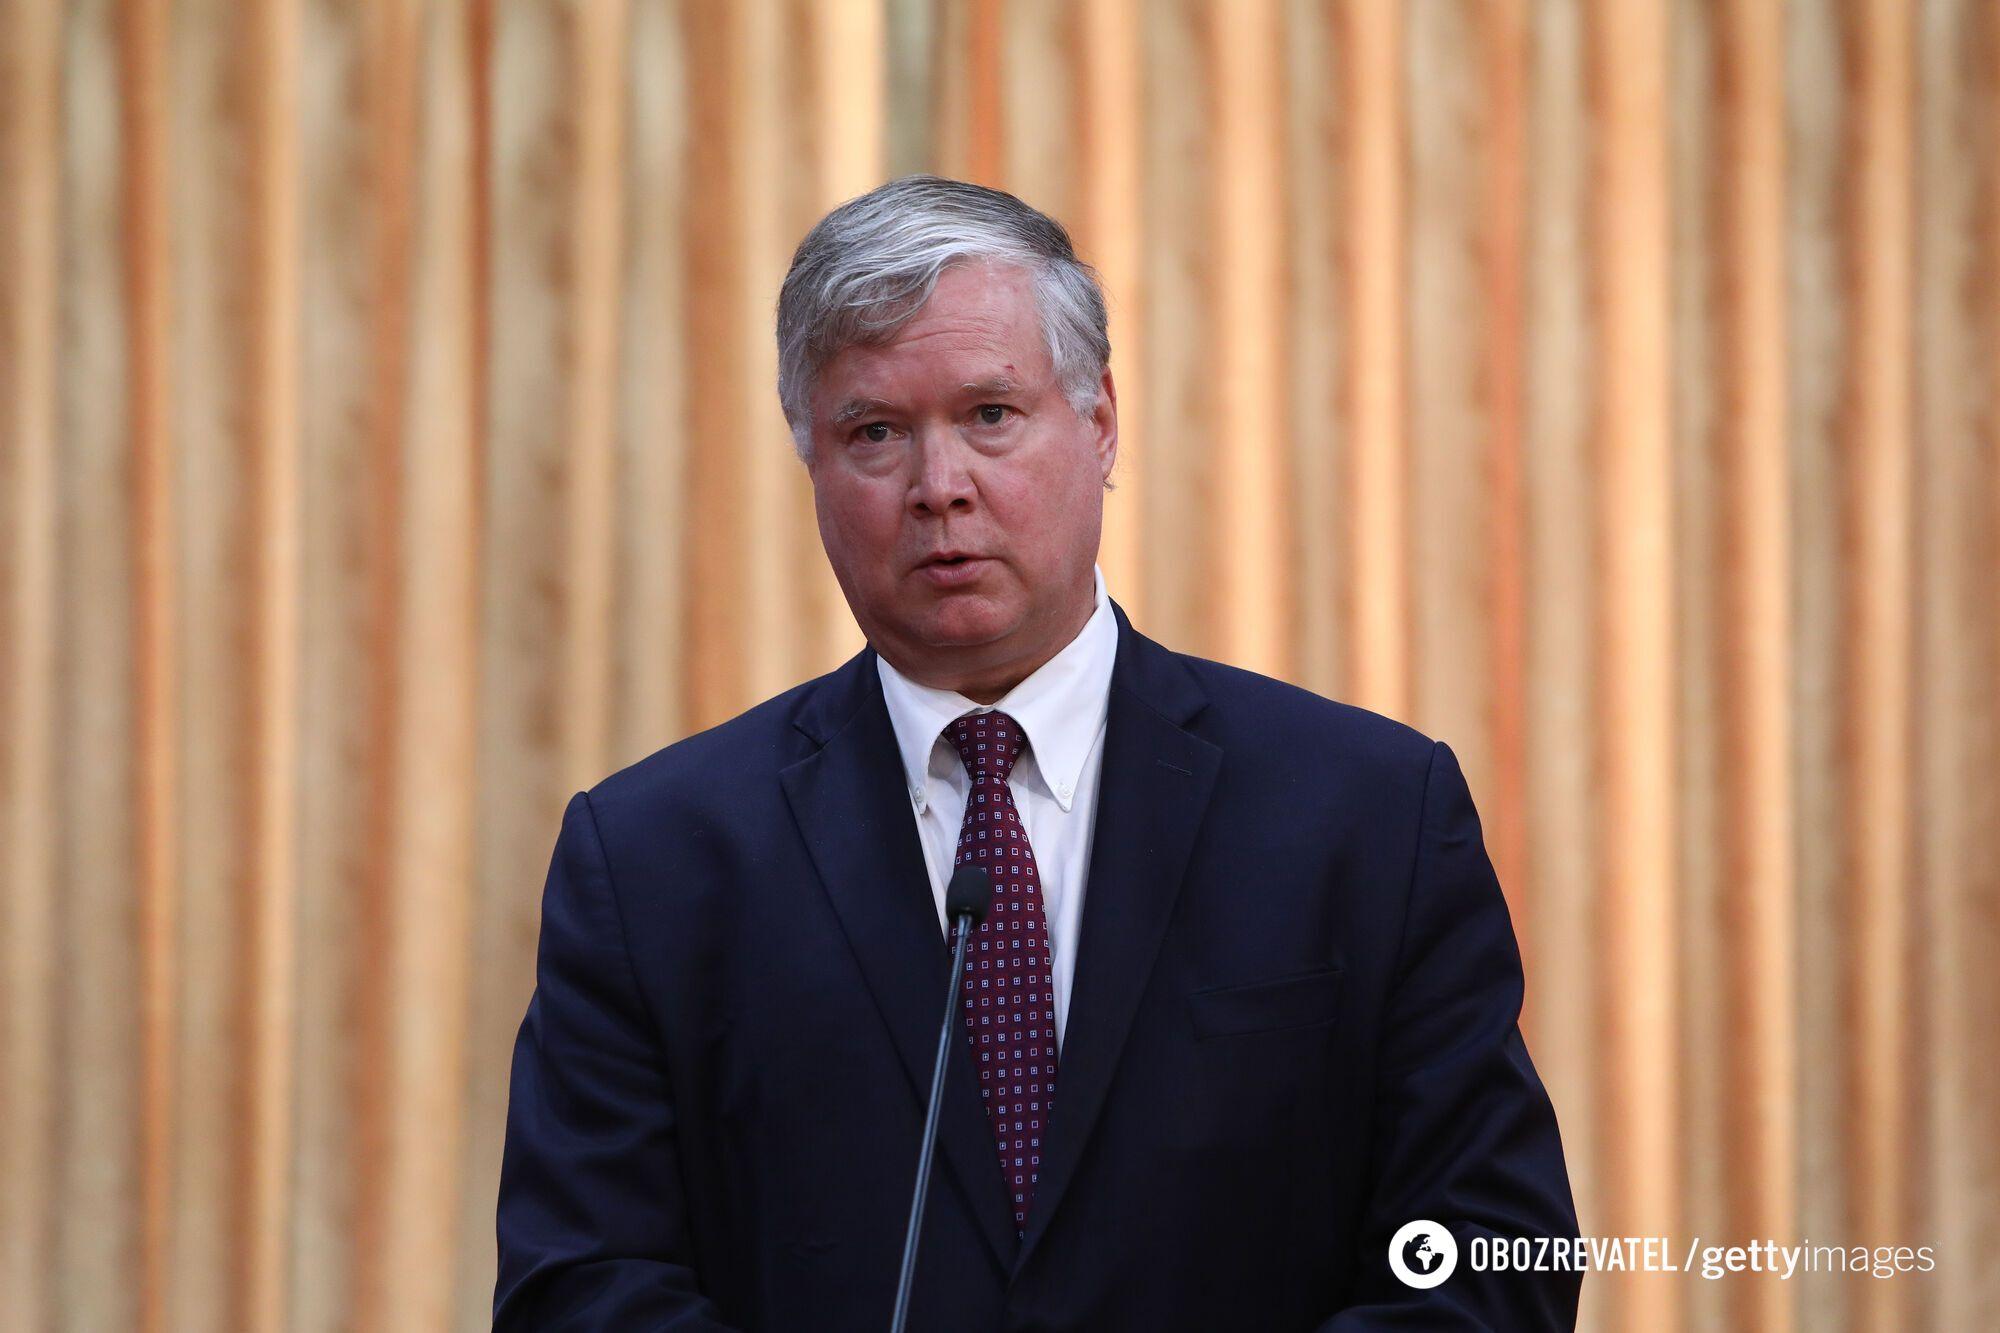 Стивен Биган заявил, что США настаивают на перевыборах в Беларуси.